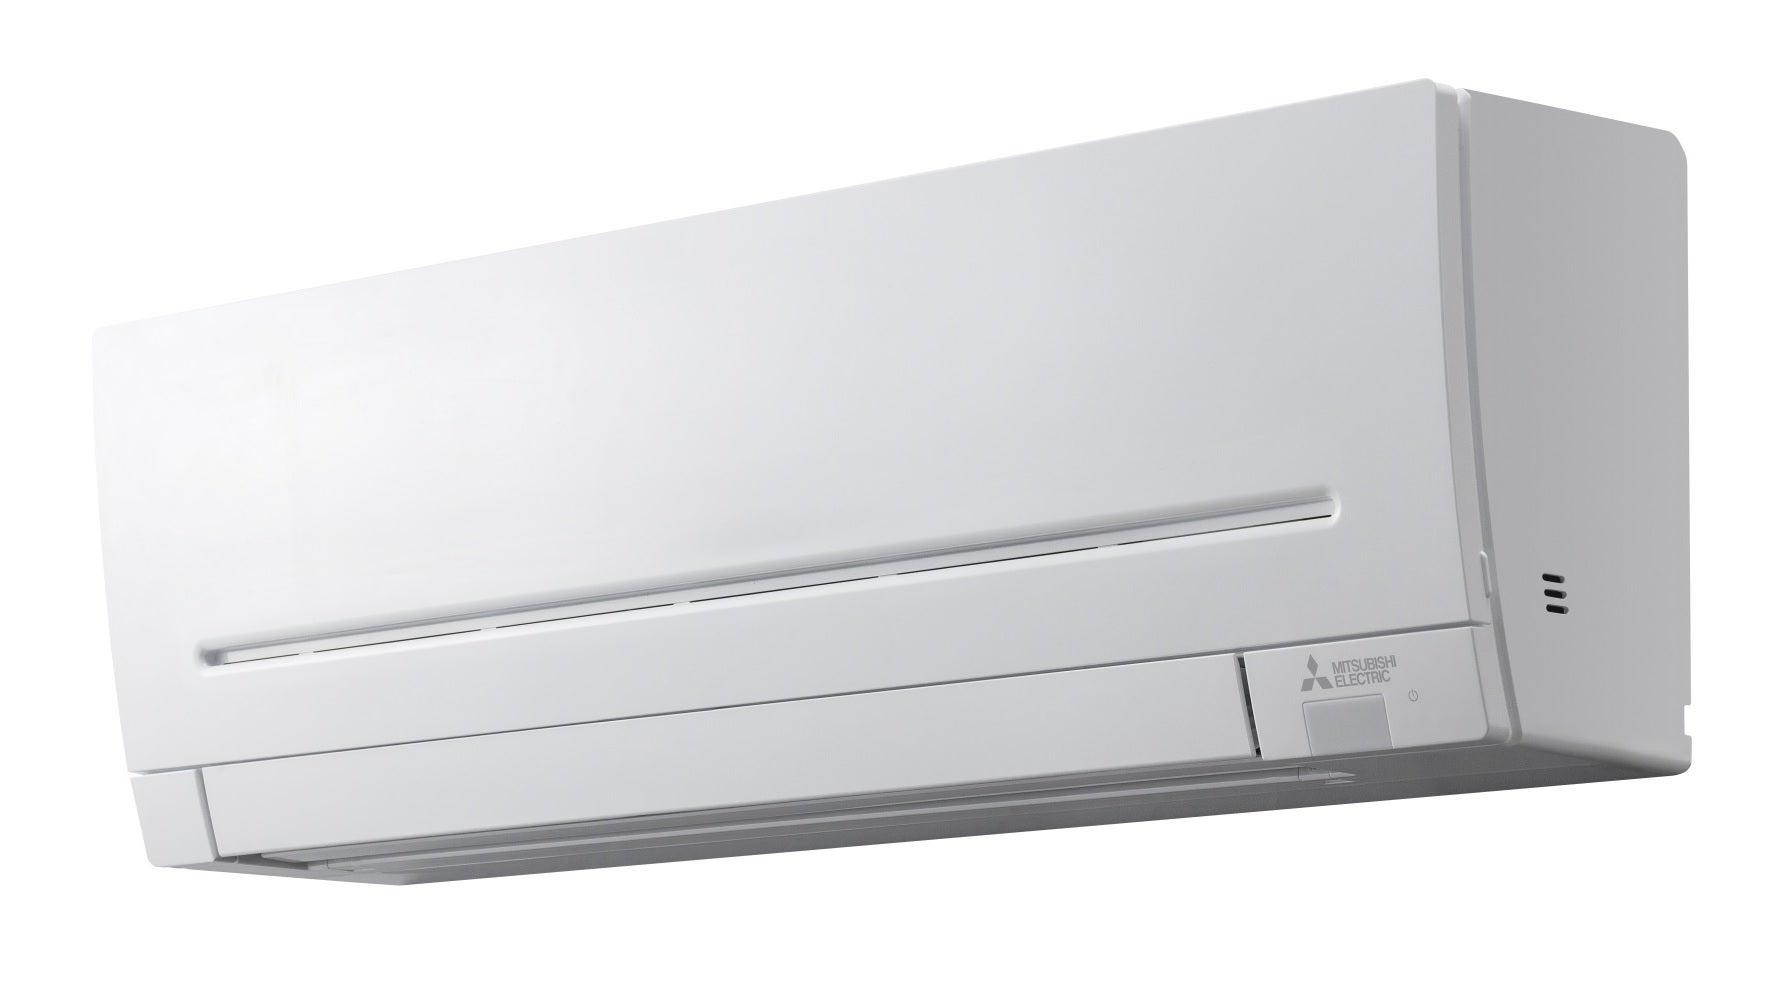 Mitsubishi MSZAP25VGD Air Conditioner